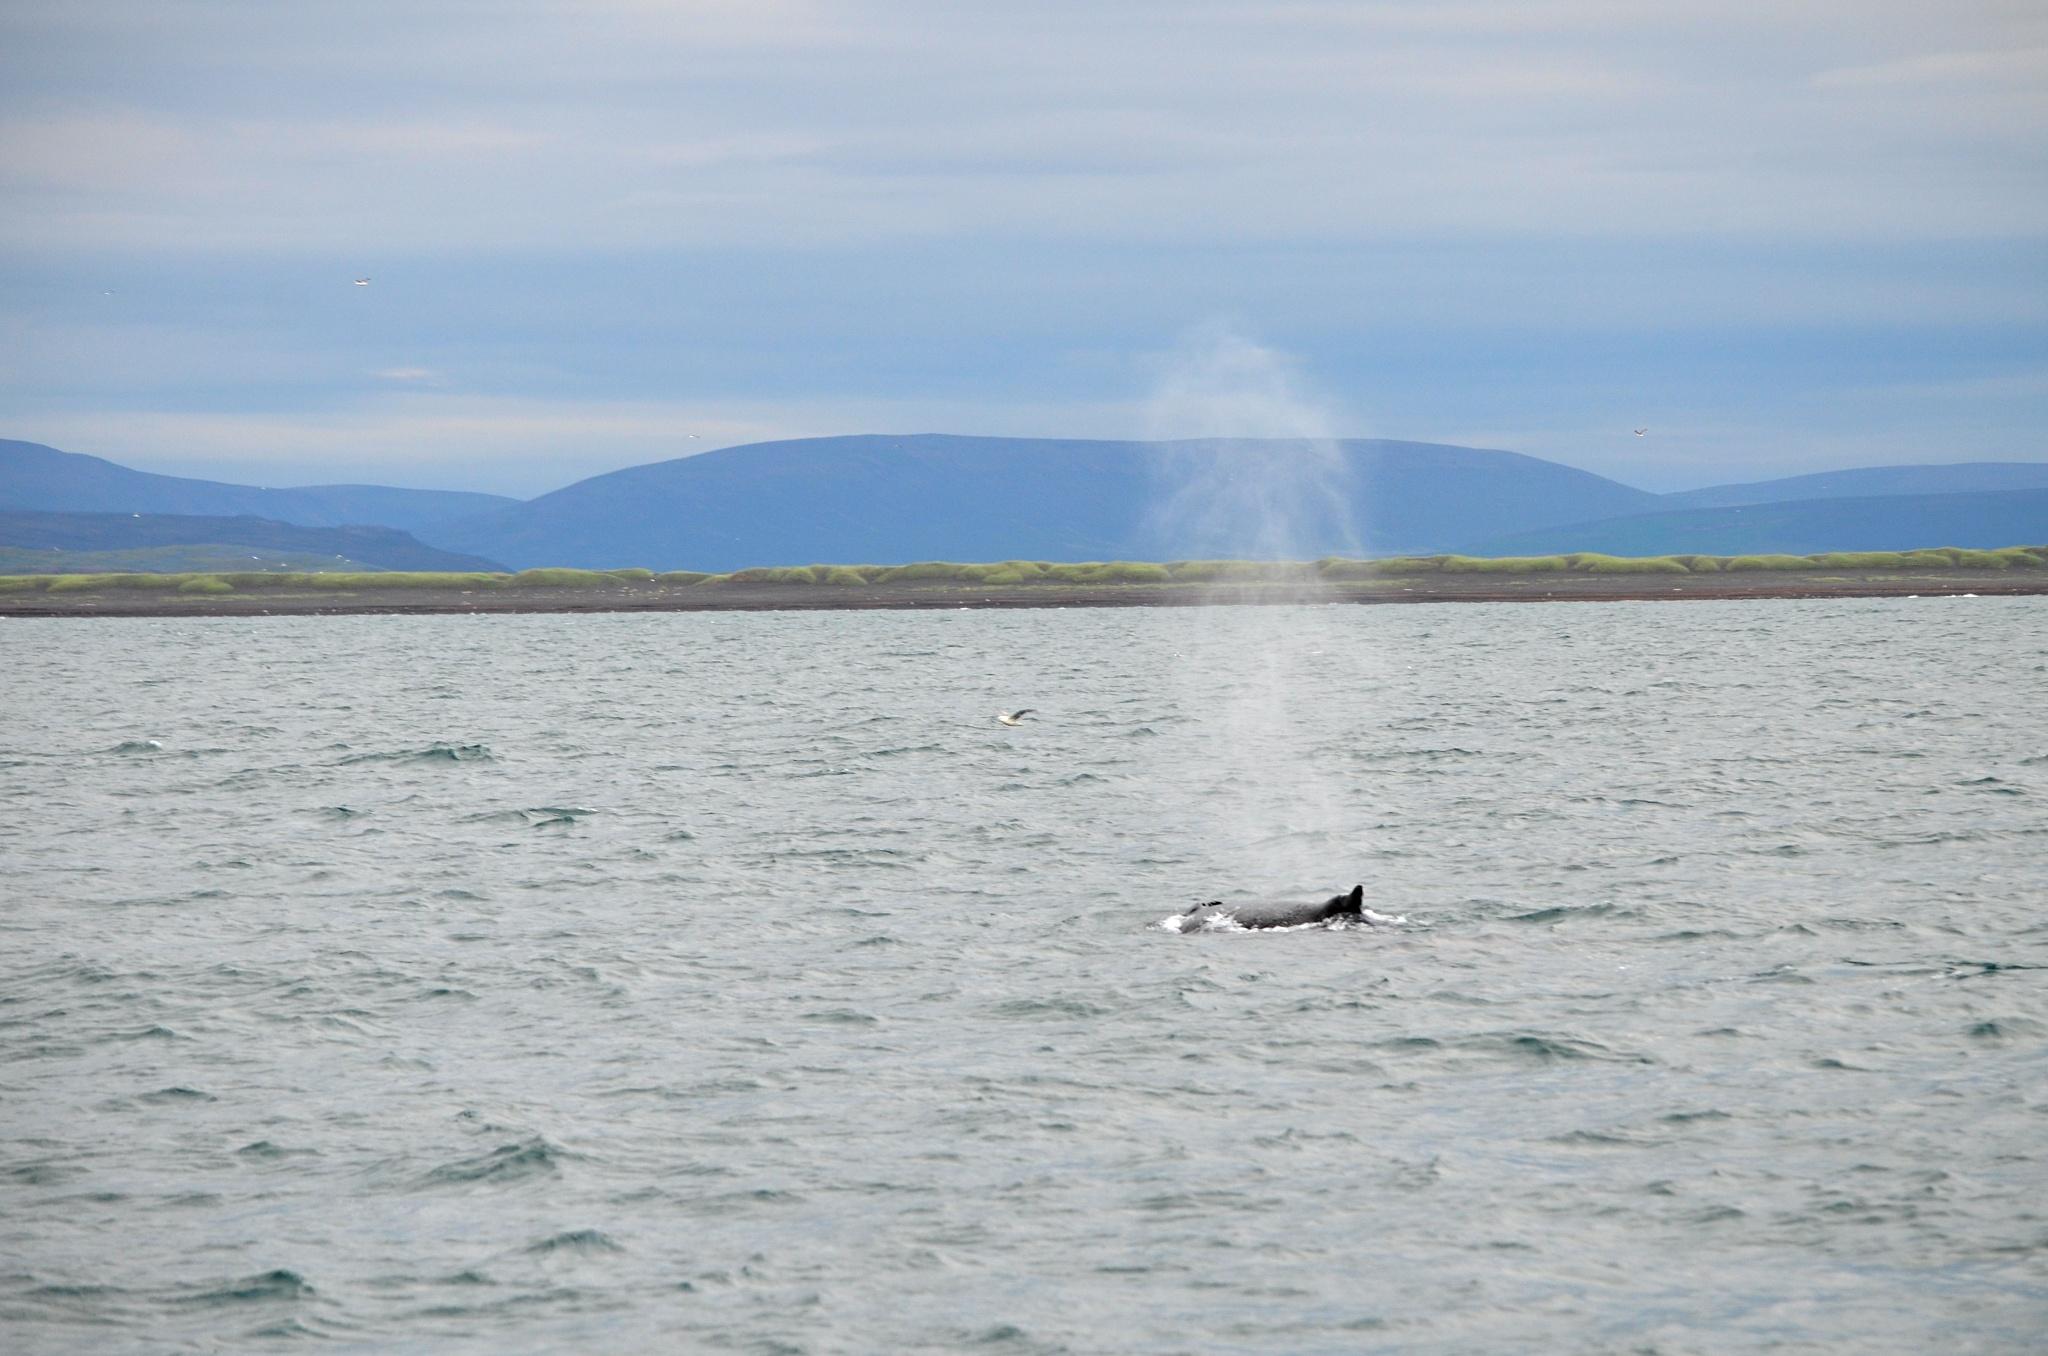 Mohutný výdech velryby